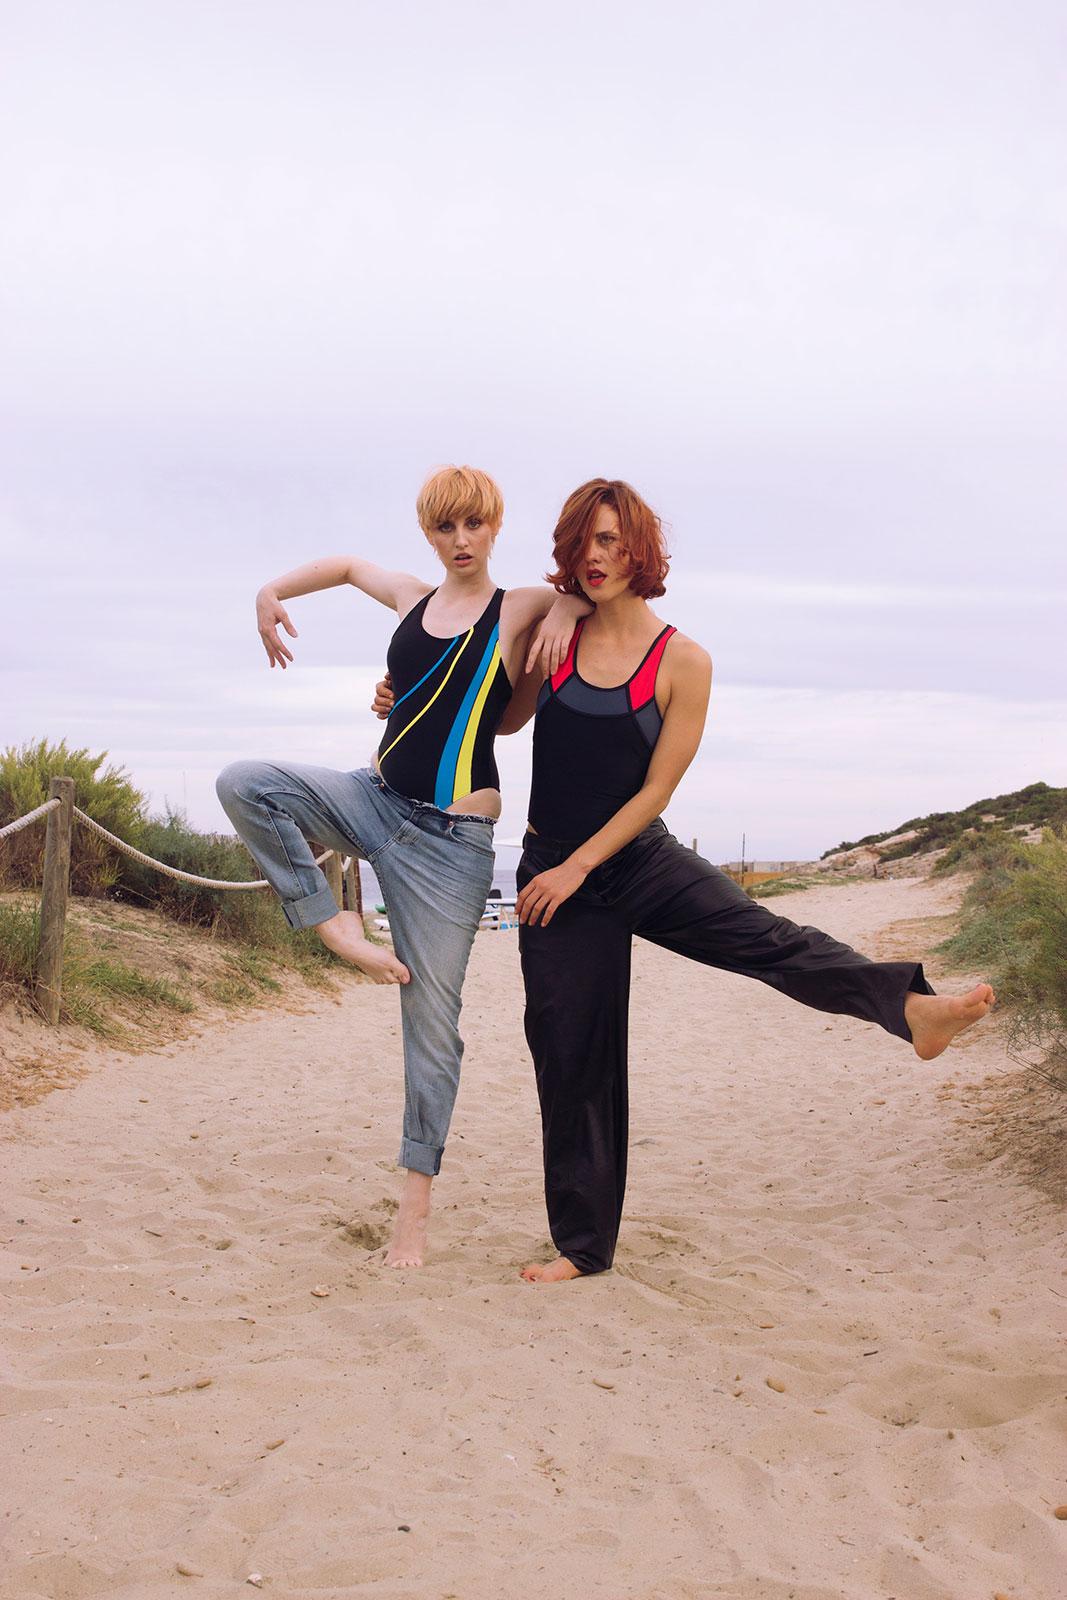 fashion photography models ibiza sandy beach